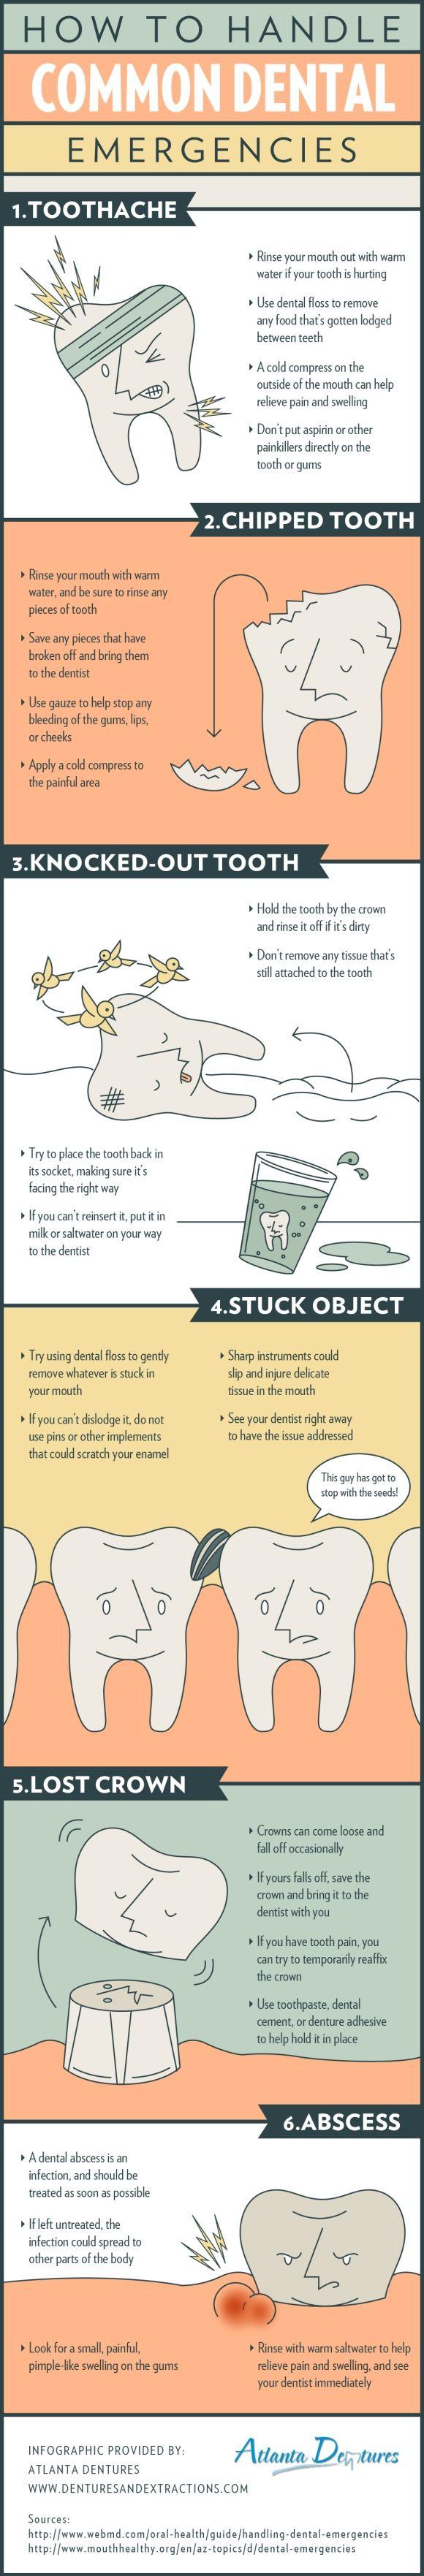 How to handle common dental emergencies! #dentist #oralhealth http://www.andregrenierdmd.com/